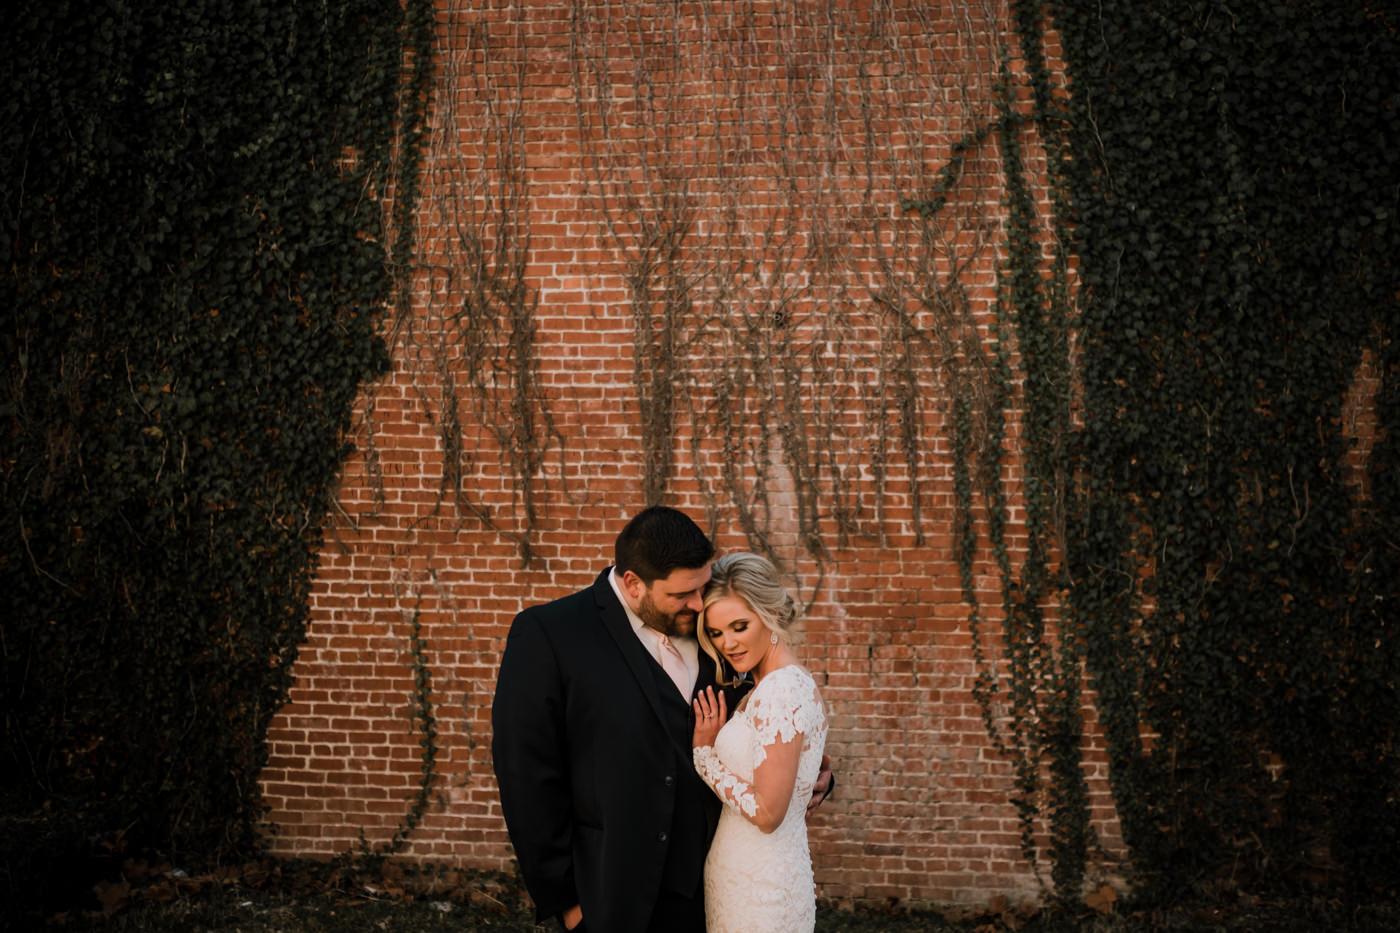 ravington.wedding.northwestarkansas.mileswittboyer-15.jpg